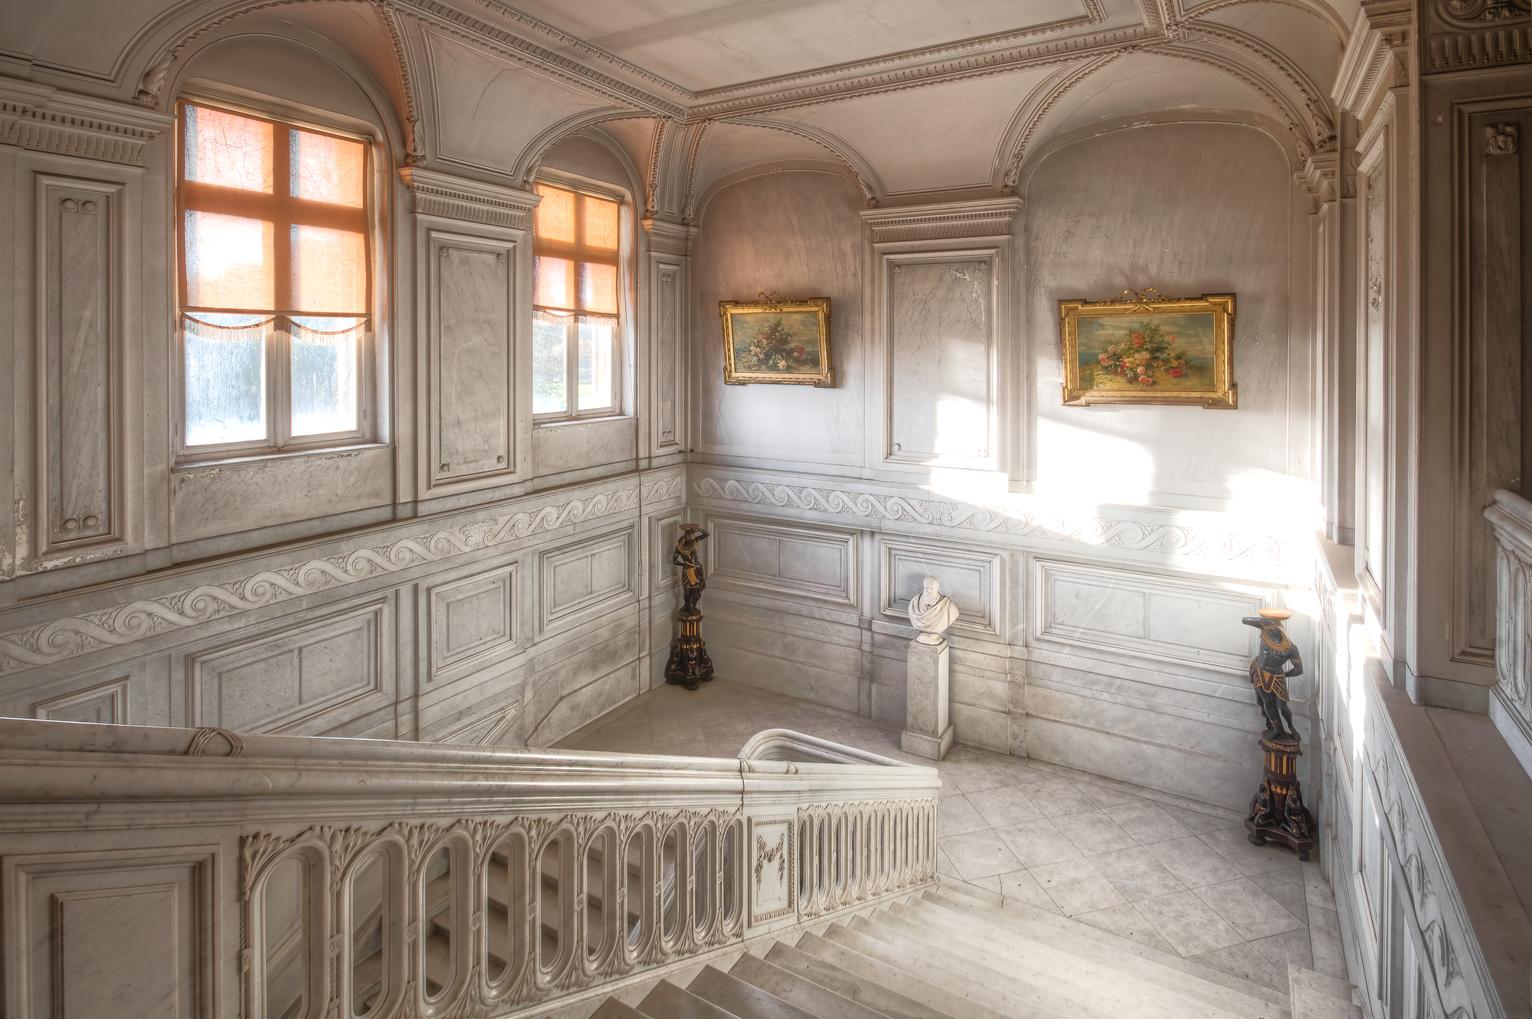 abandonedcastle_3 the castle has an amazing marble